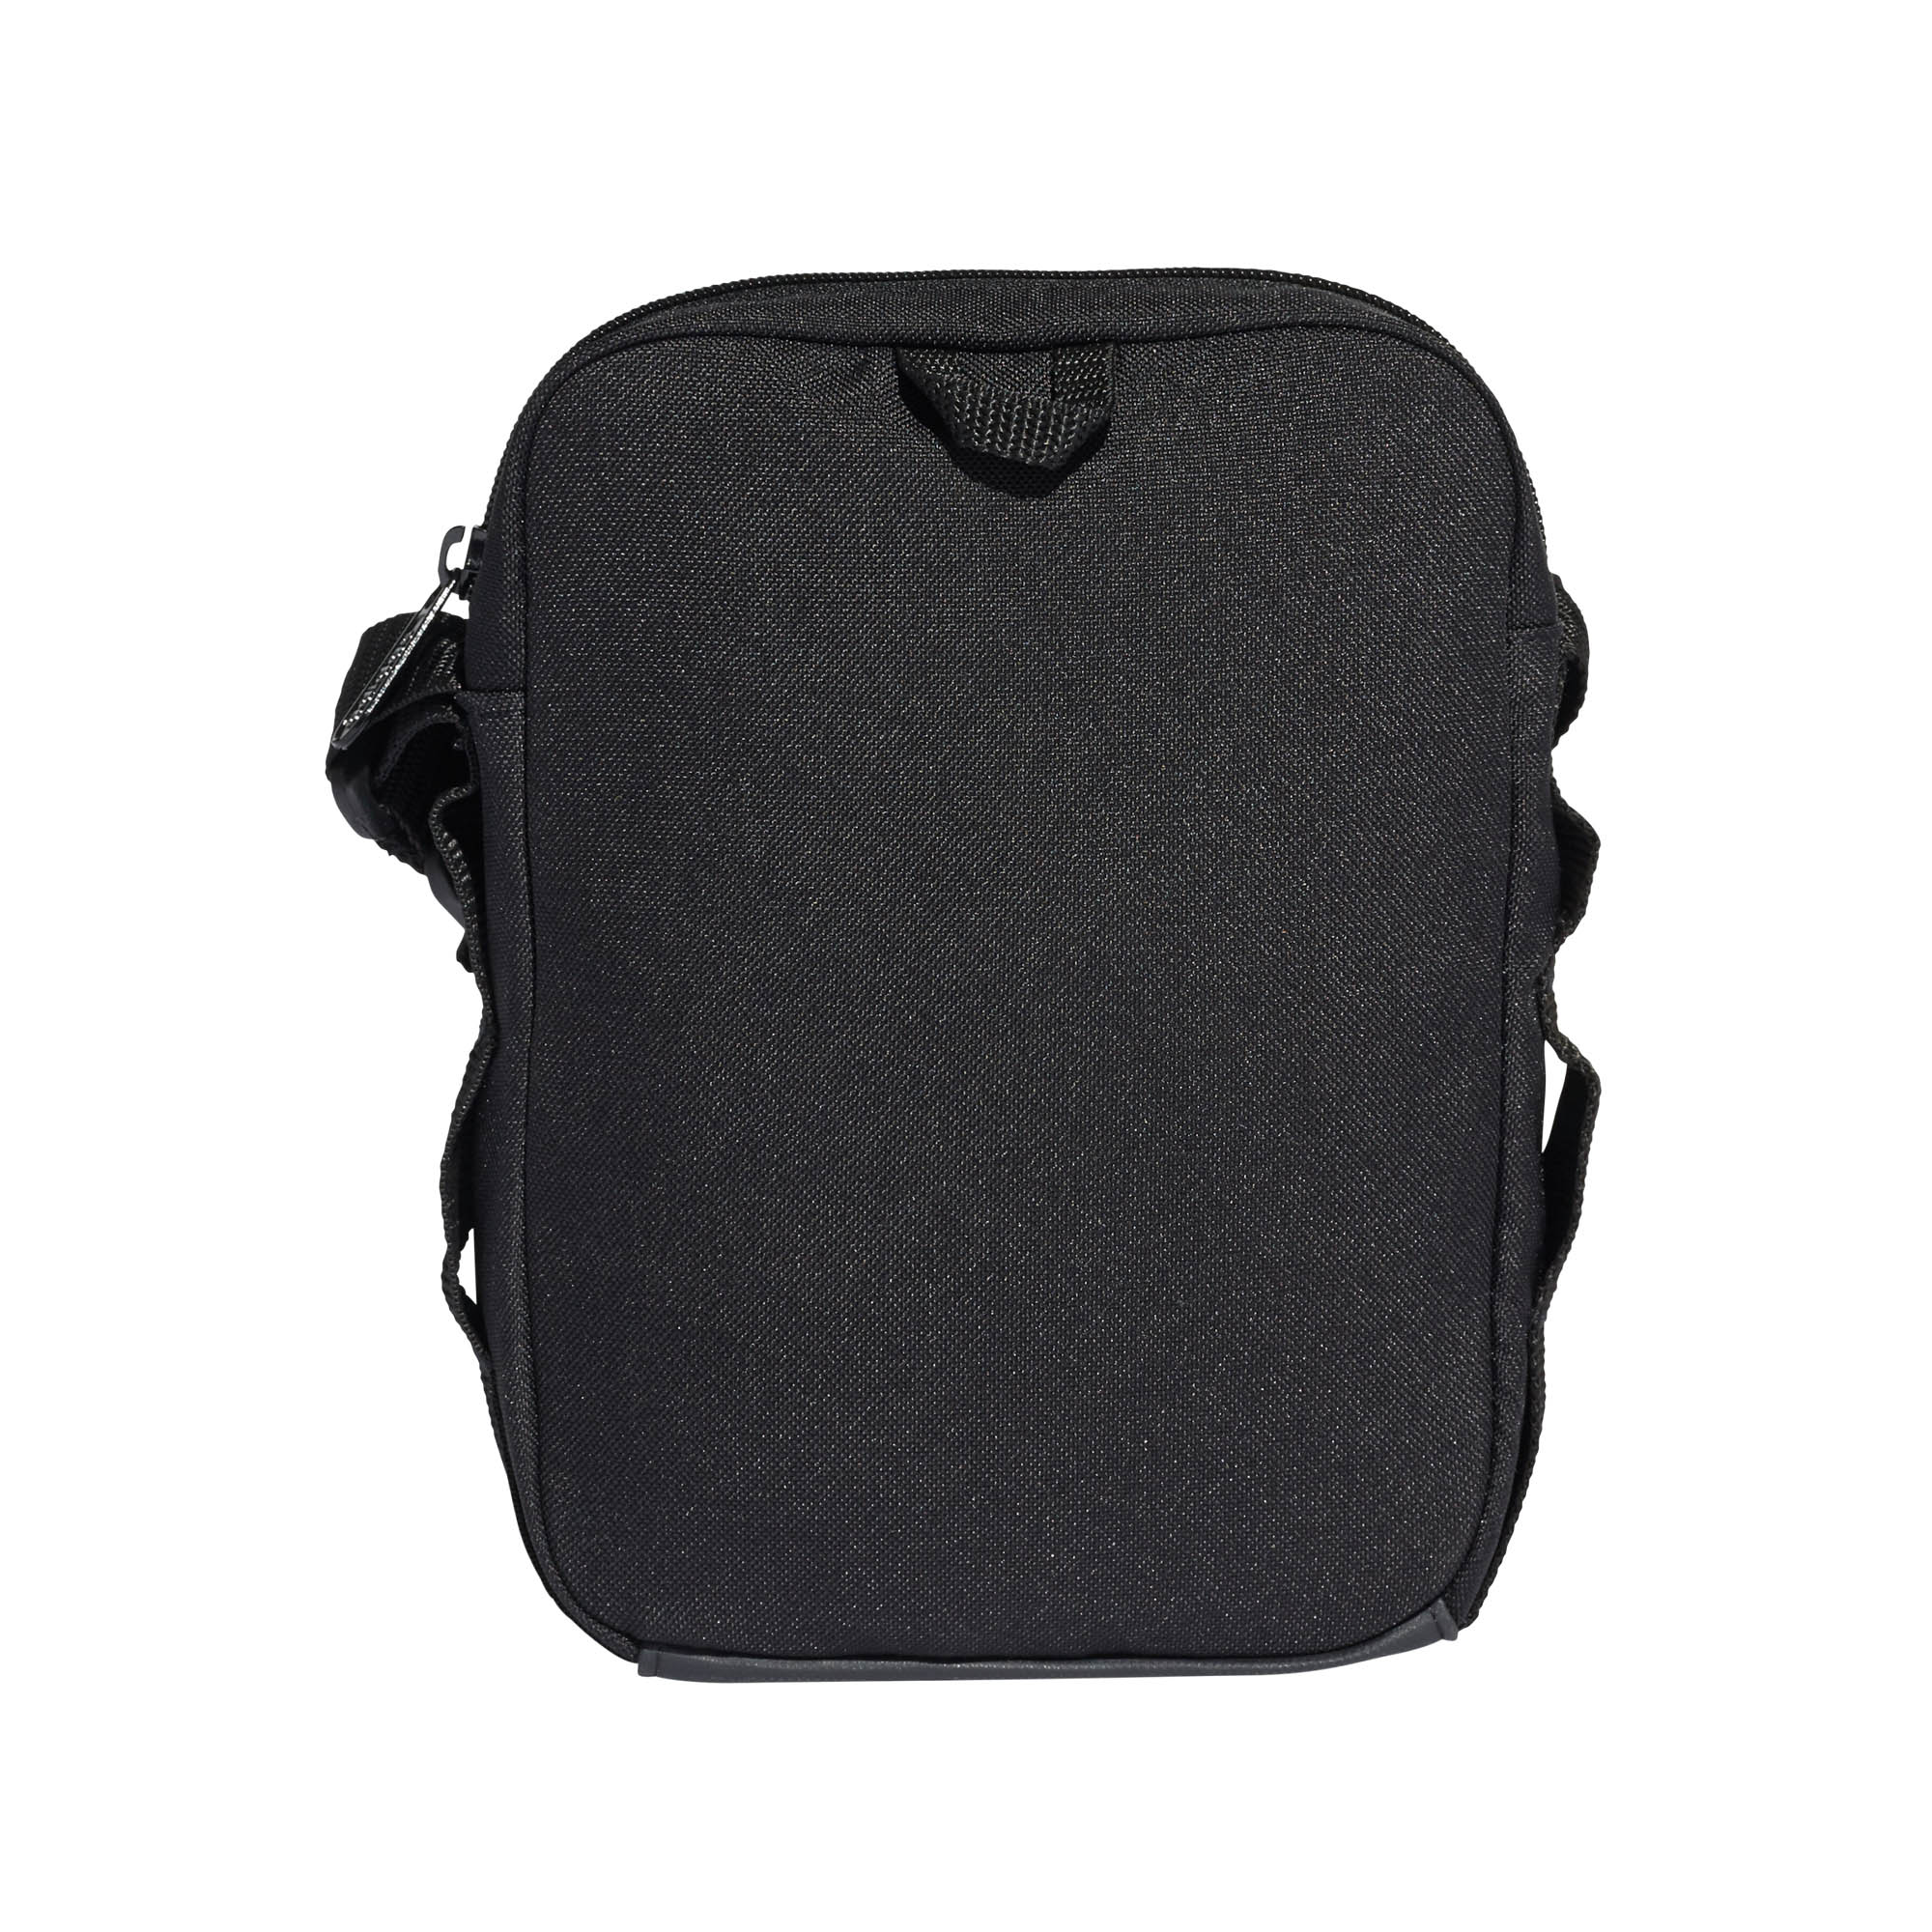 adidas Linear Core Organiser Shoulder Small Item Man Bag - Black White 02838e7157